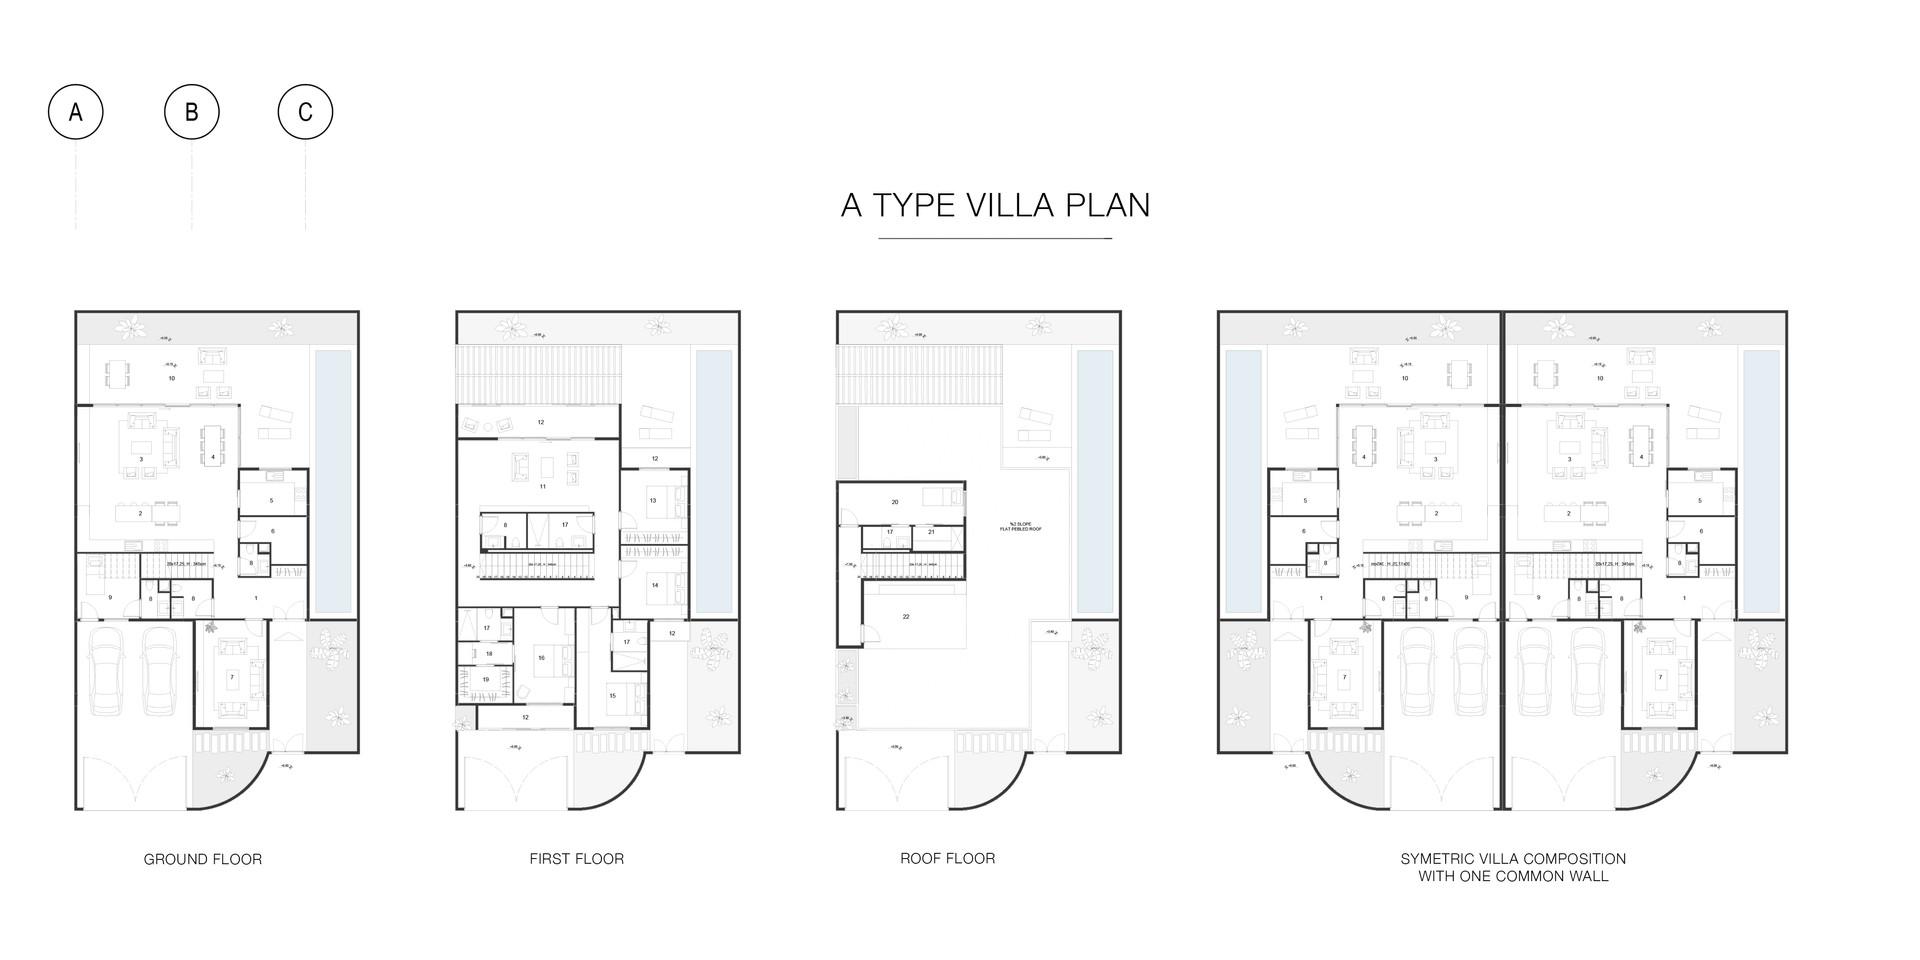 _A_ type sibling villa plan